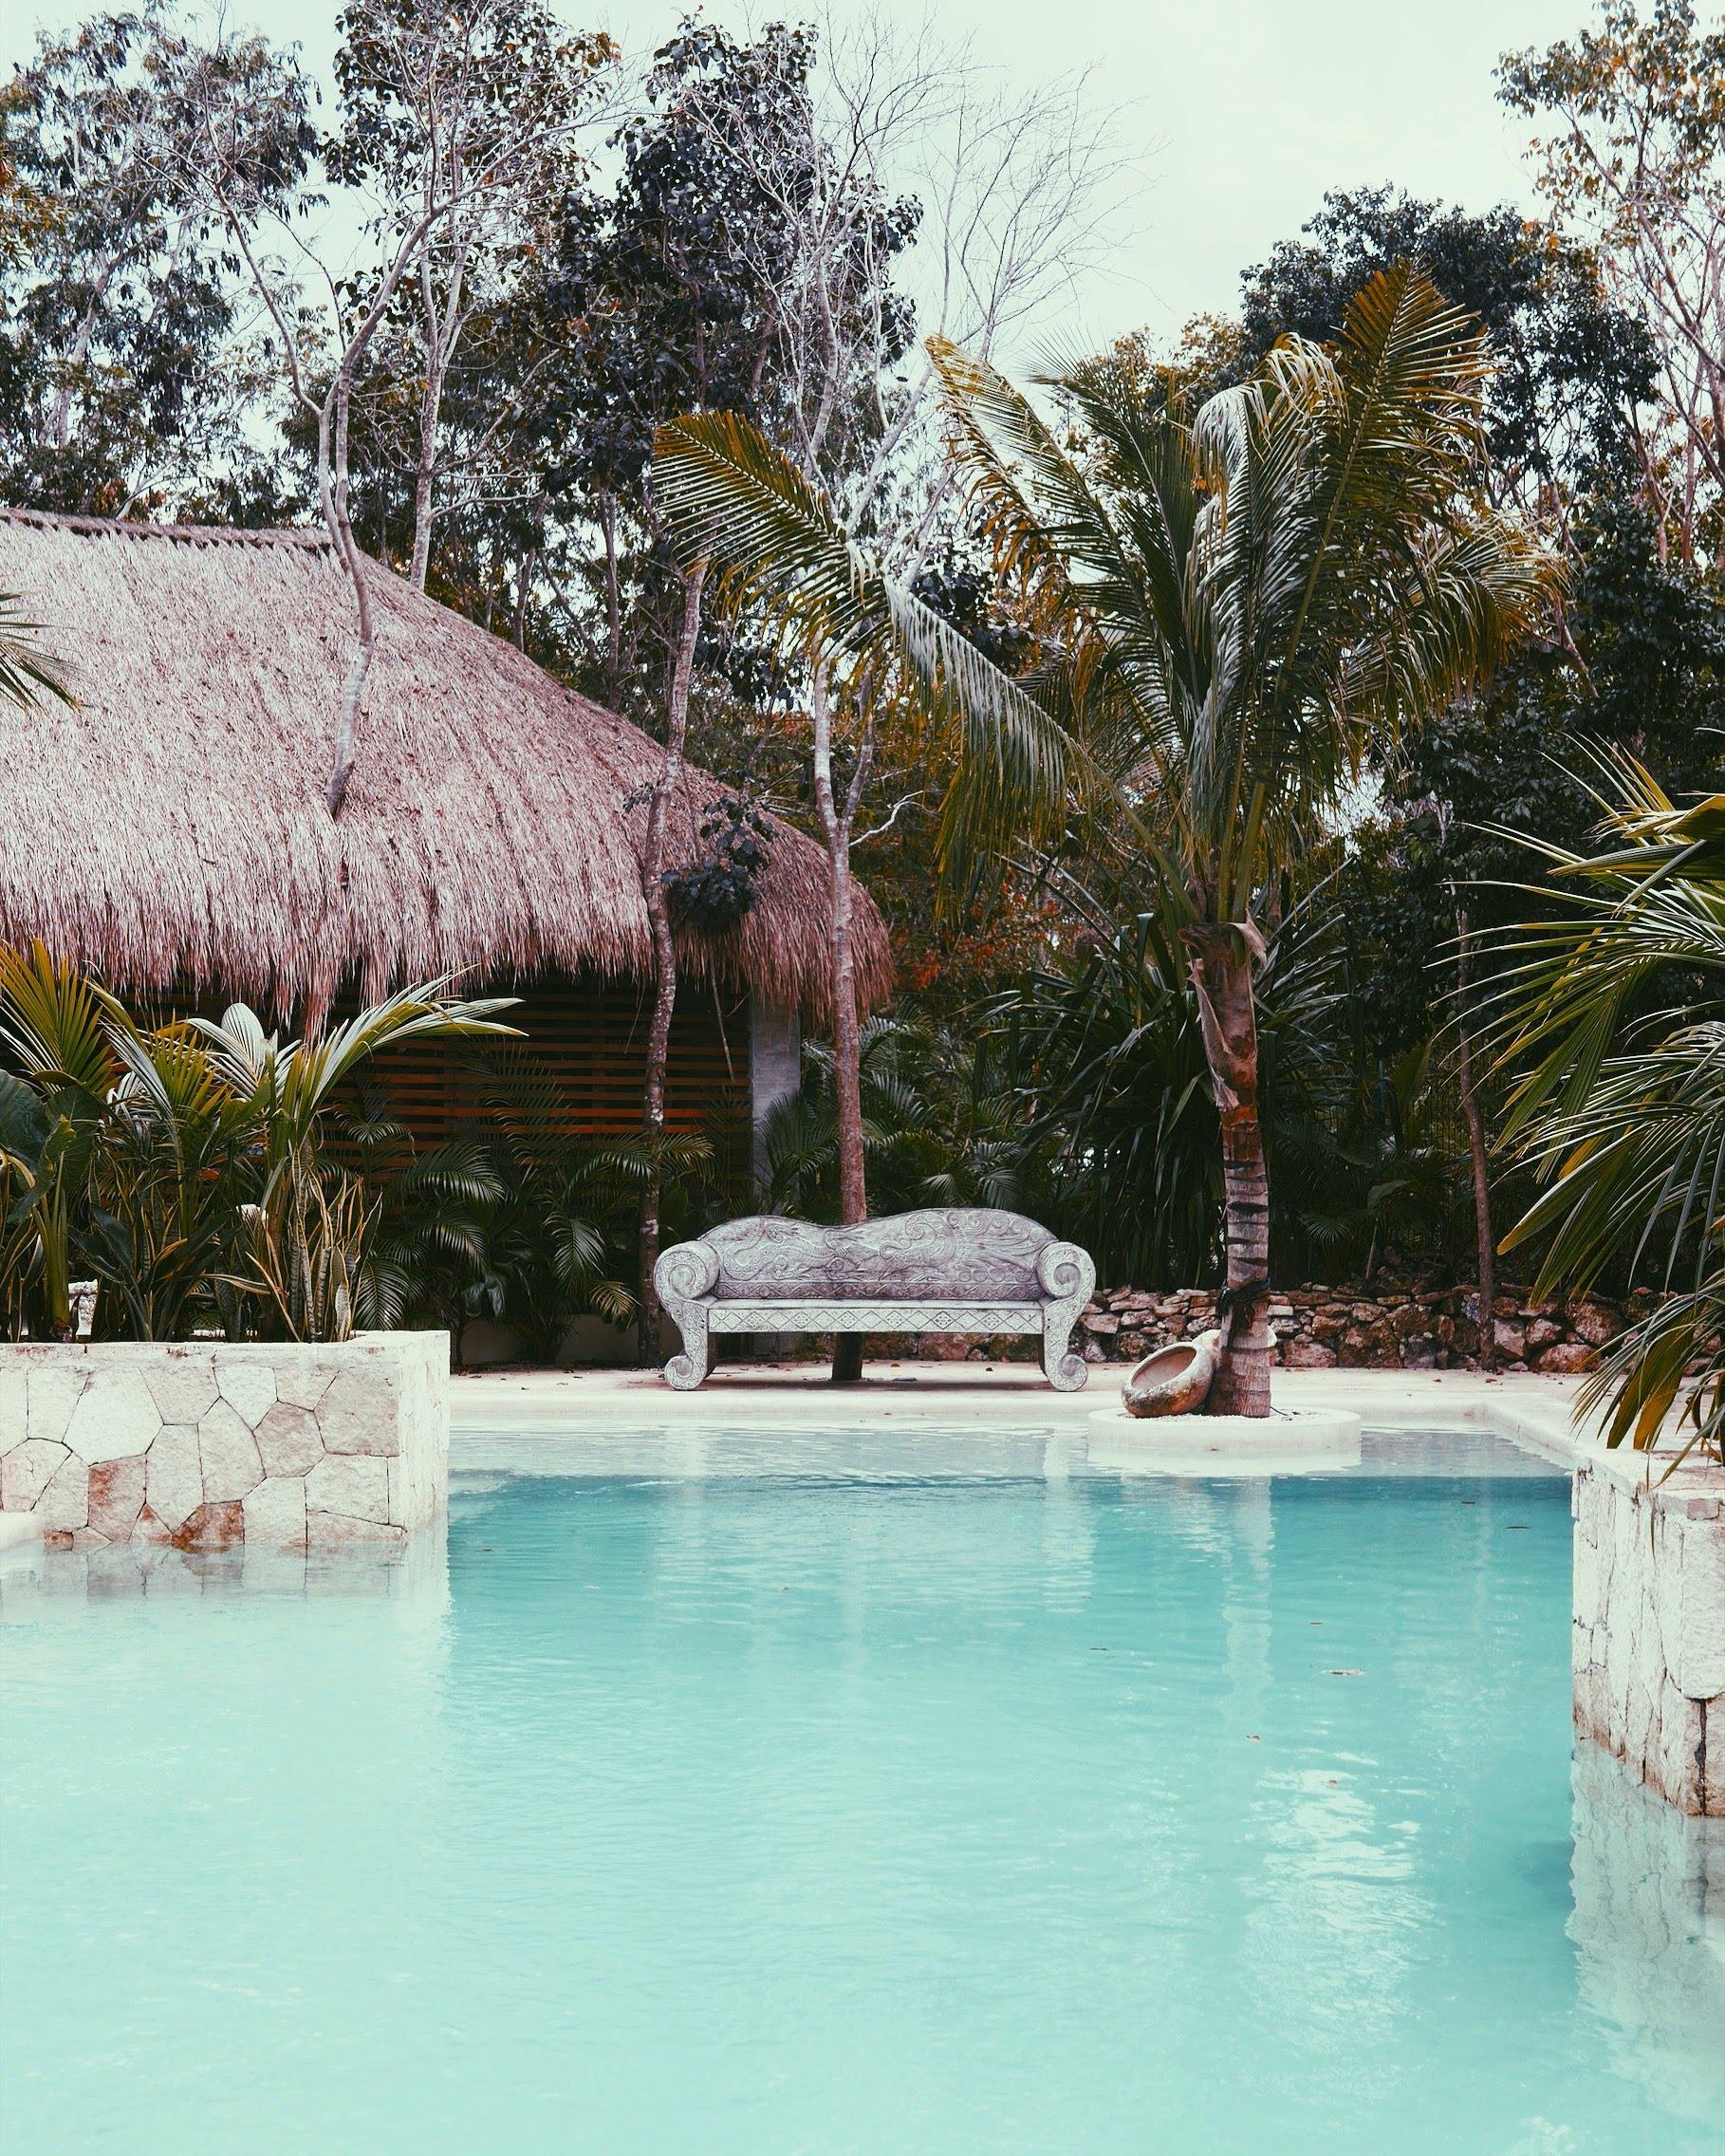 The pool area at Una Vida